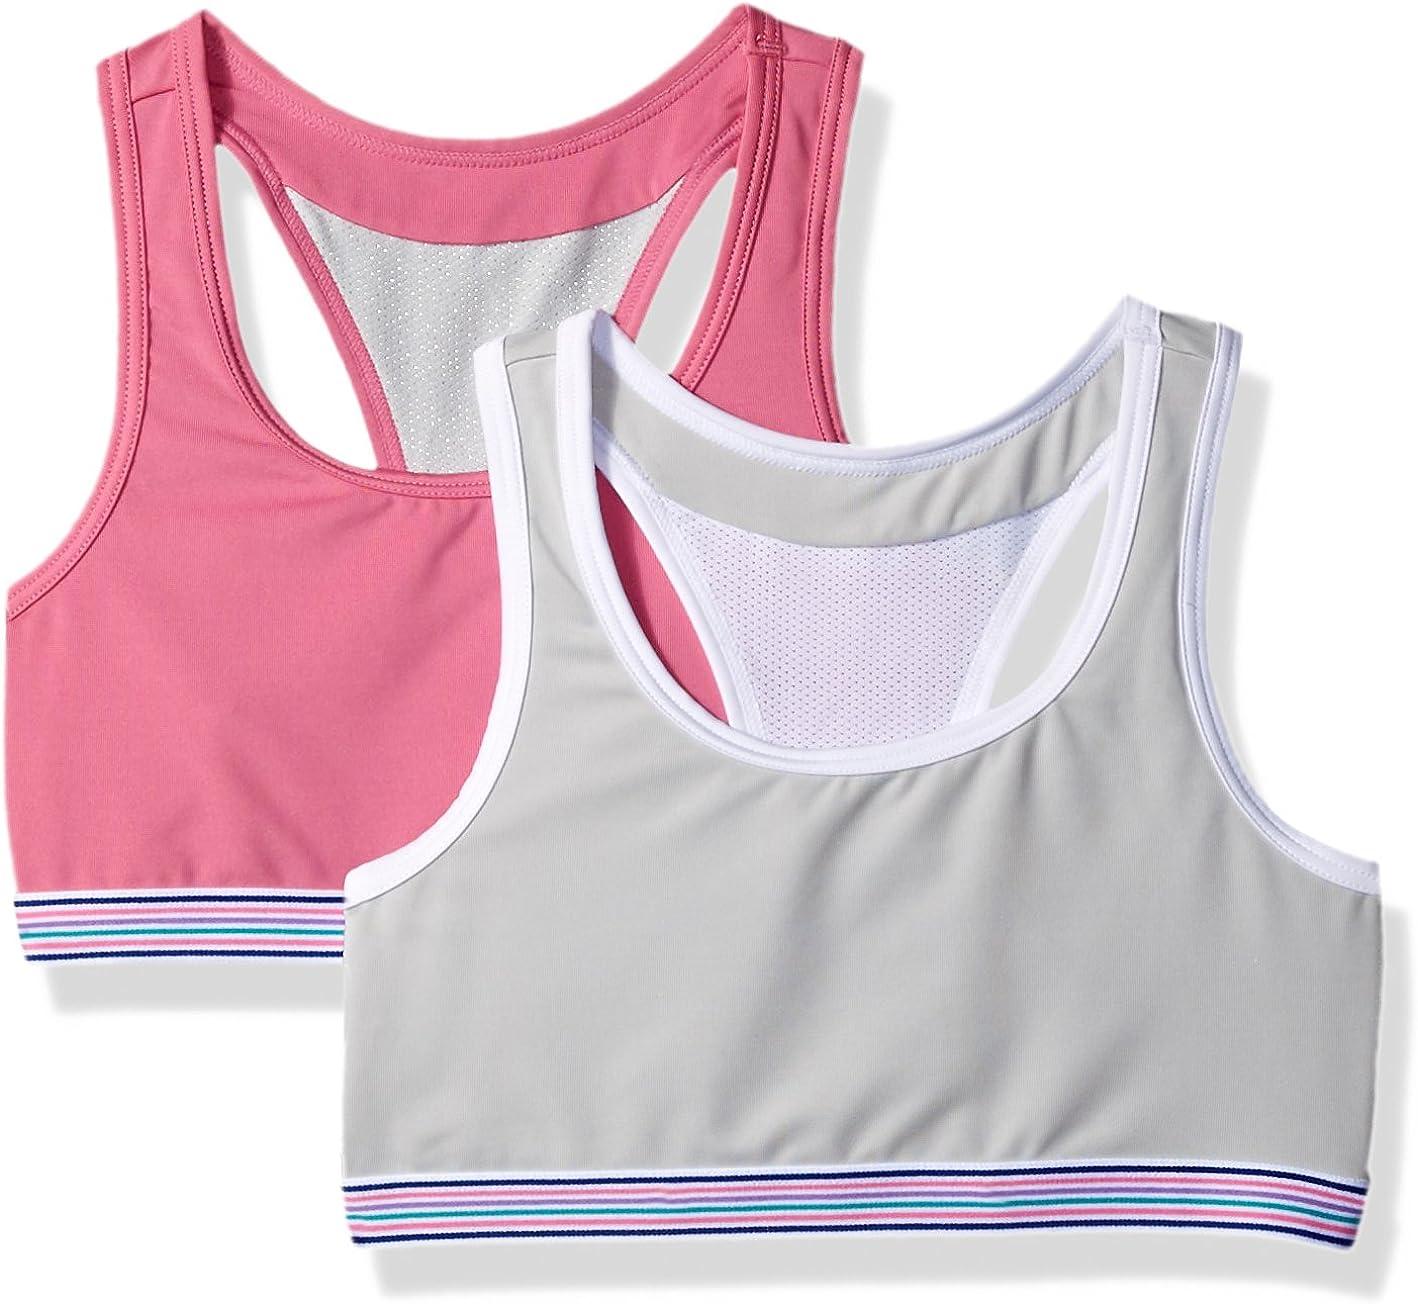 Hanes Girls Comfort Flex Fit Wide Strap Seamless Racerback 2-Pack Training Bra